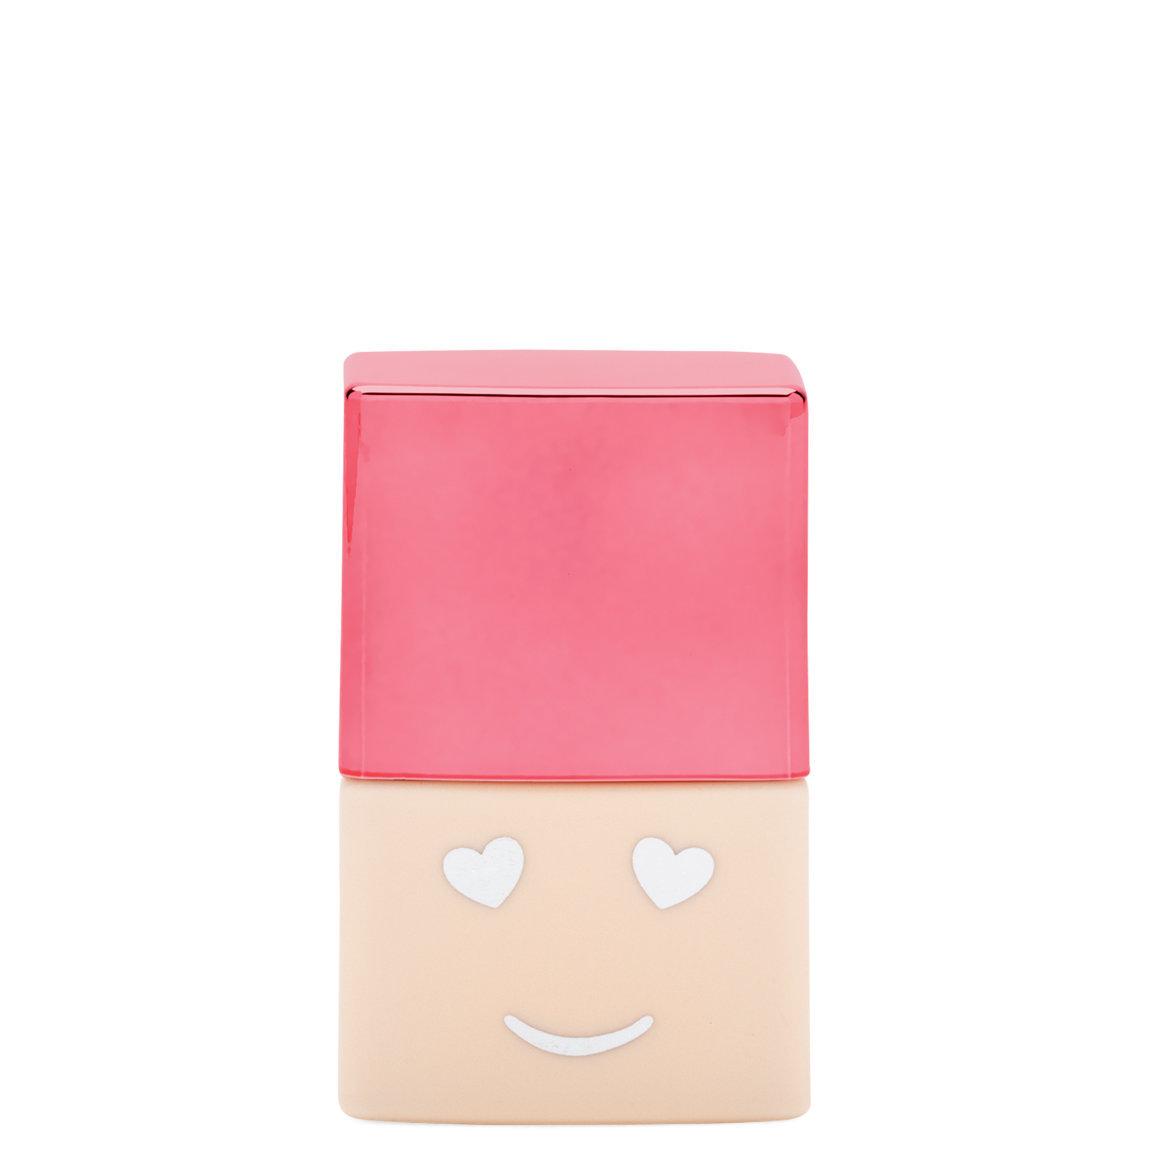 Benefit Cosmetics Hello Happy Soft Blur Foundation Mini 01 Fair - Cool alternative view 1.